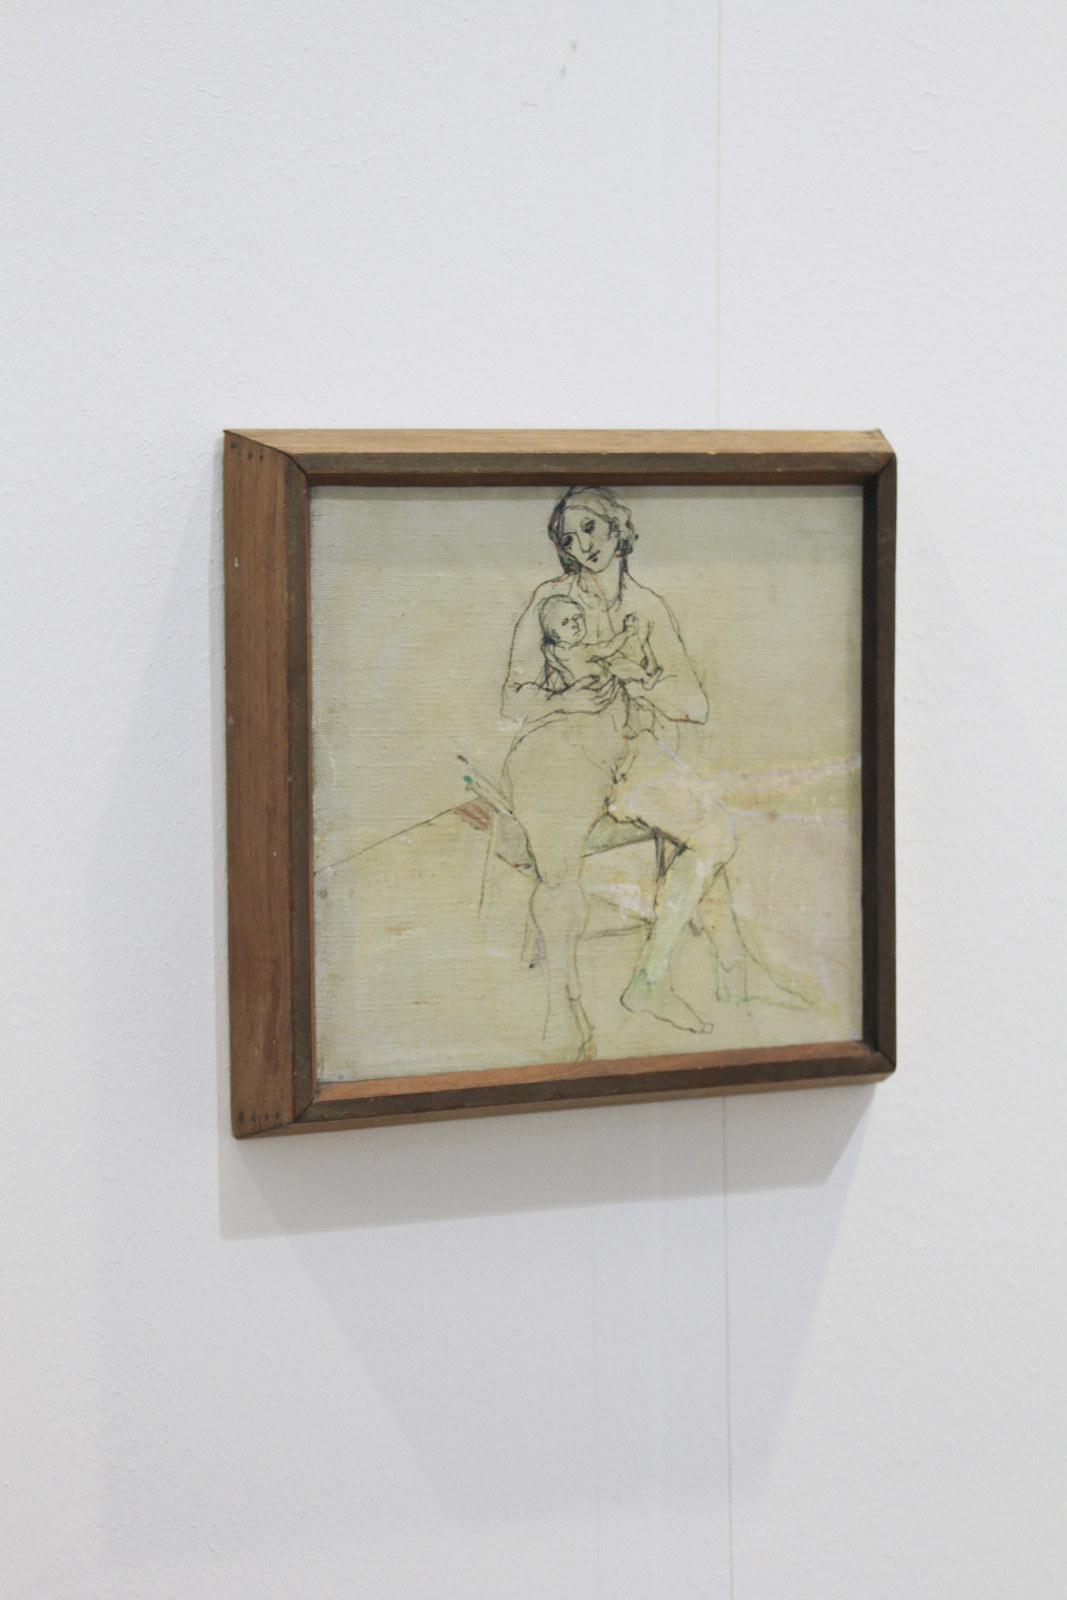 Lynn Hershman Leeson at Vilma Gold, London 02